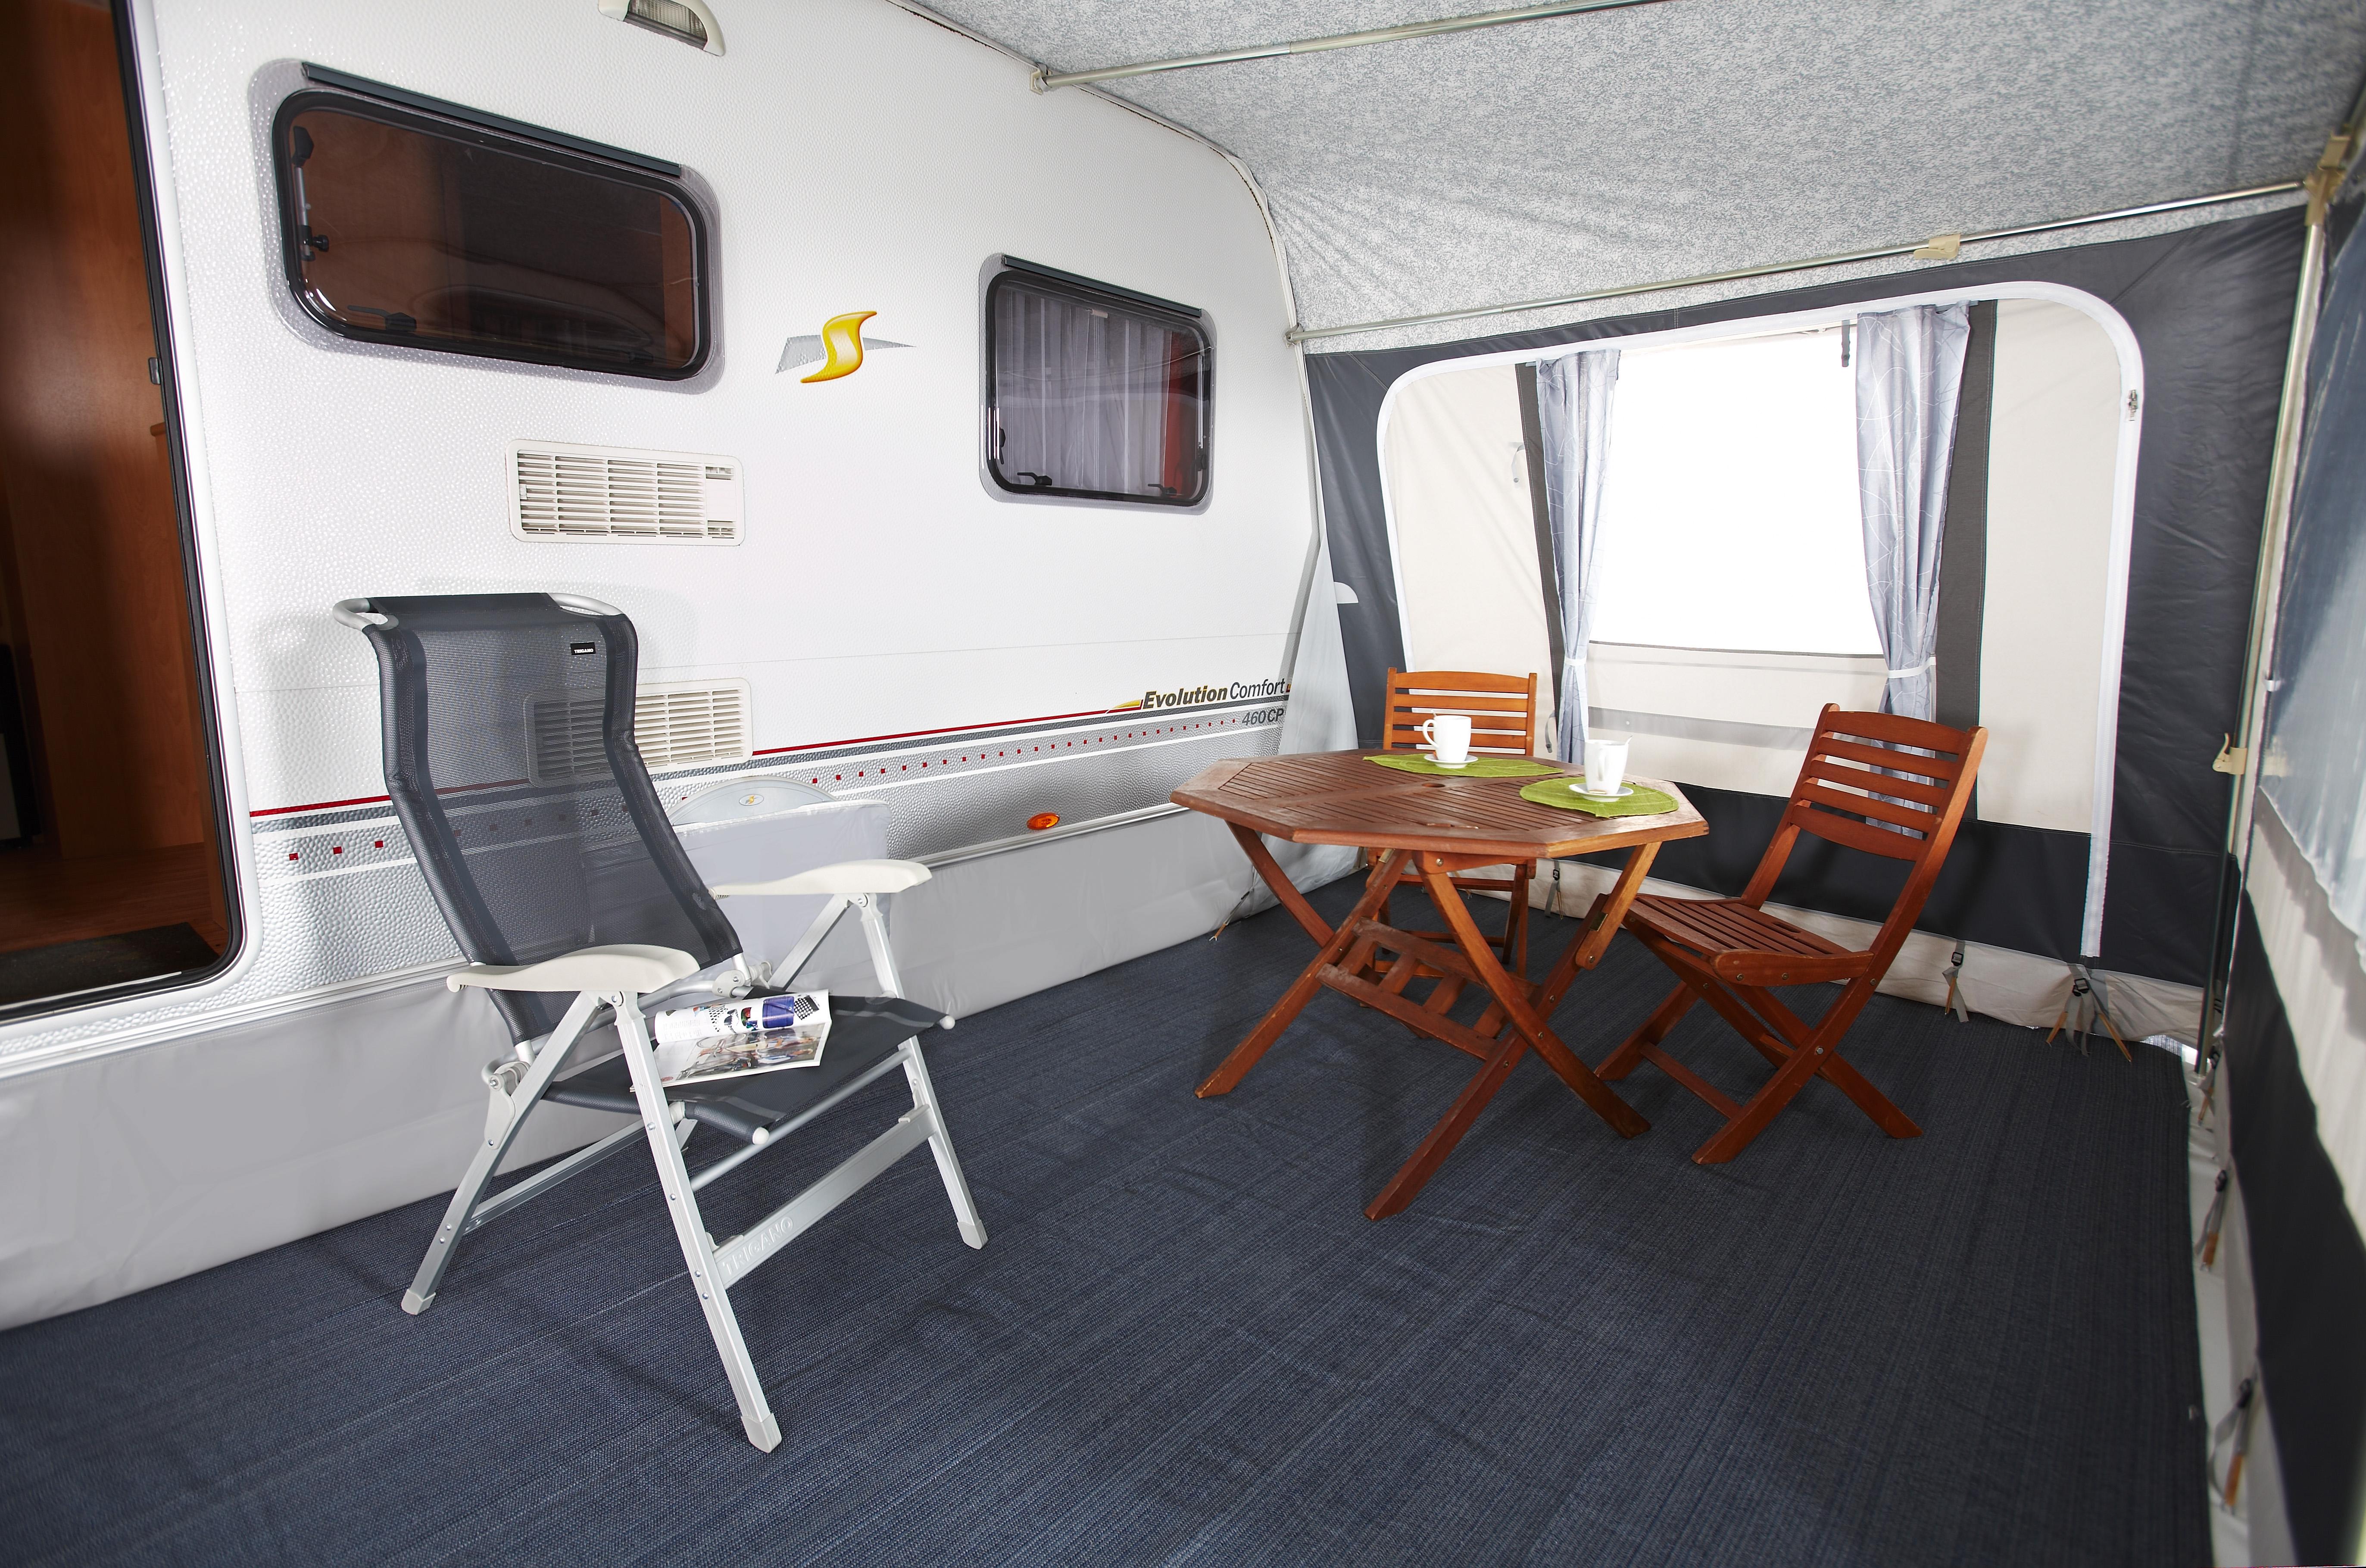 tapis de sol 2m50 trigano m t25cy11 boutique supermarket. Black Bedroom Furniture Sets. Home Design Ideas